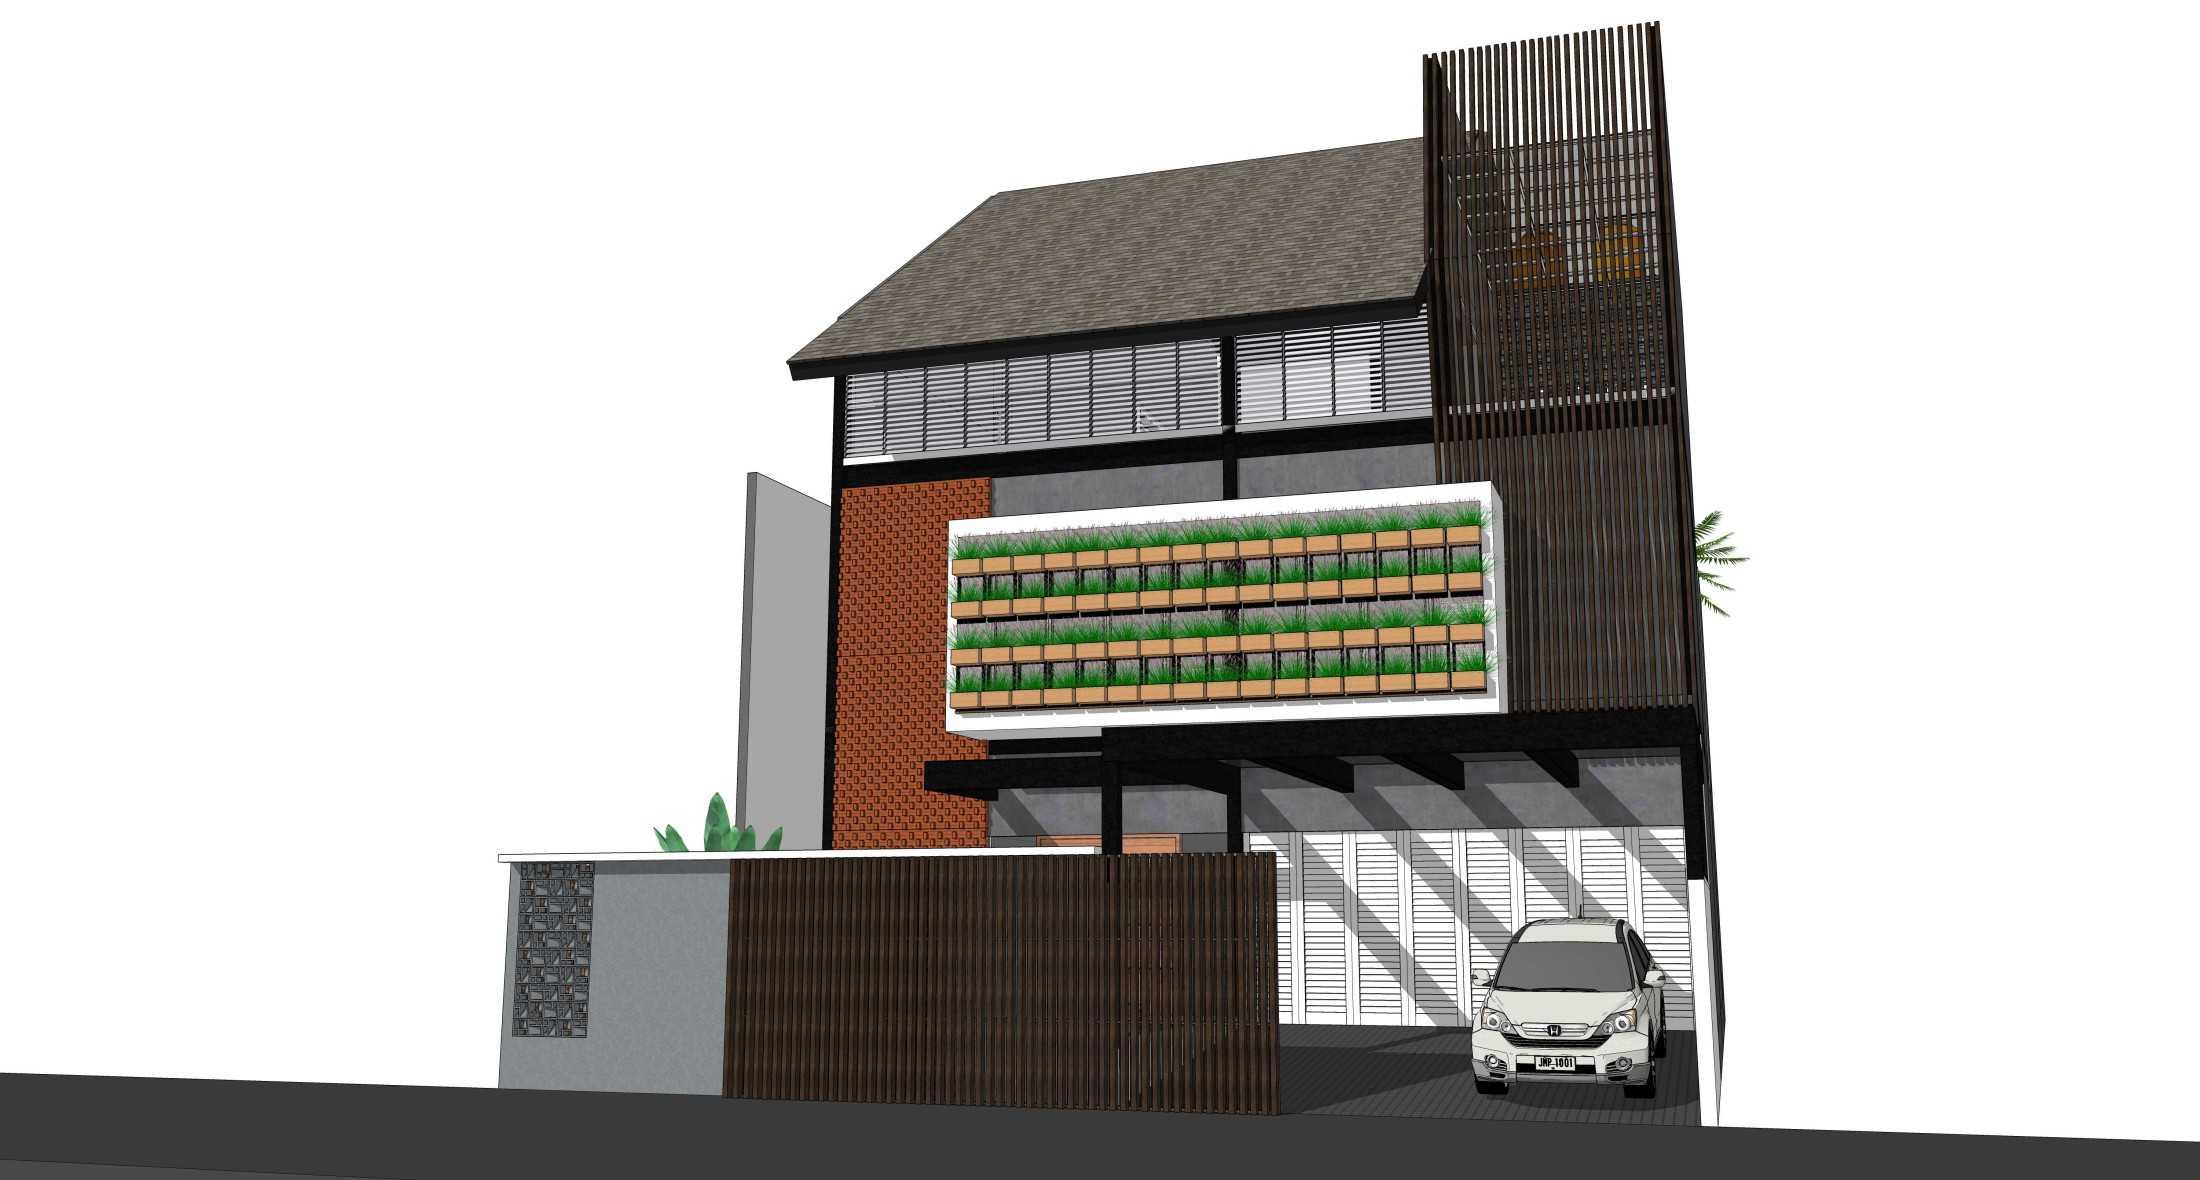 Triplus Homes Gg House Kec. Kby. Baru, Kota Jakarta Selatan, Daerah Khusus Ibukota Jakarta, Indonesia Kec. Kby. Baru, Kota Jakarta Selatan, Daerah Khusus Ibukota Jakarta, Indonesia Triplus-Homes-Gg-House  103300